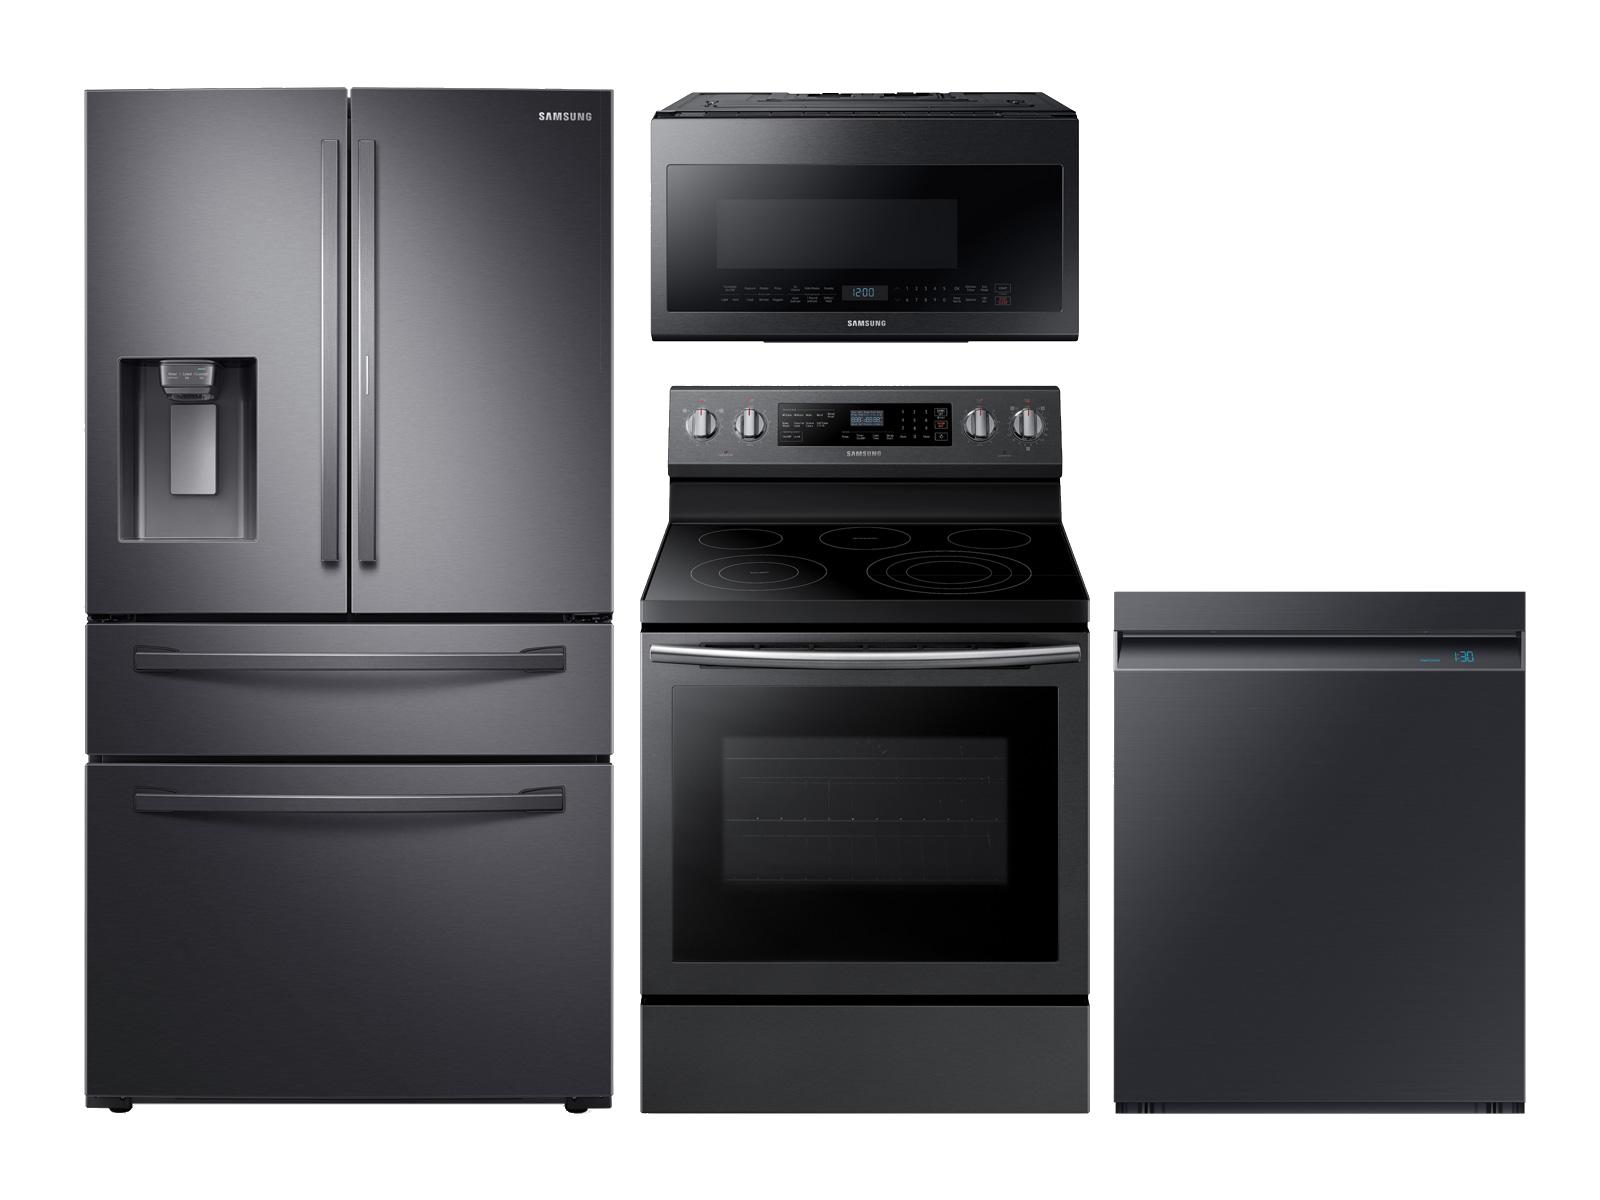 Samsung 4-door Refrigerator + Electric Range + Linear Wash Dishwasher + Microwave Kitchen Package in Black Stainless